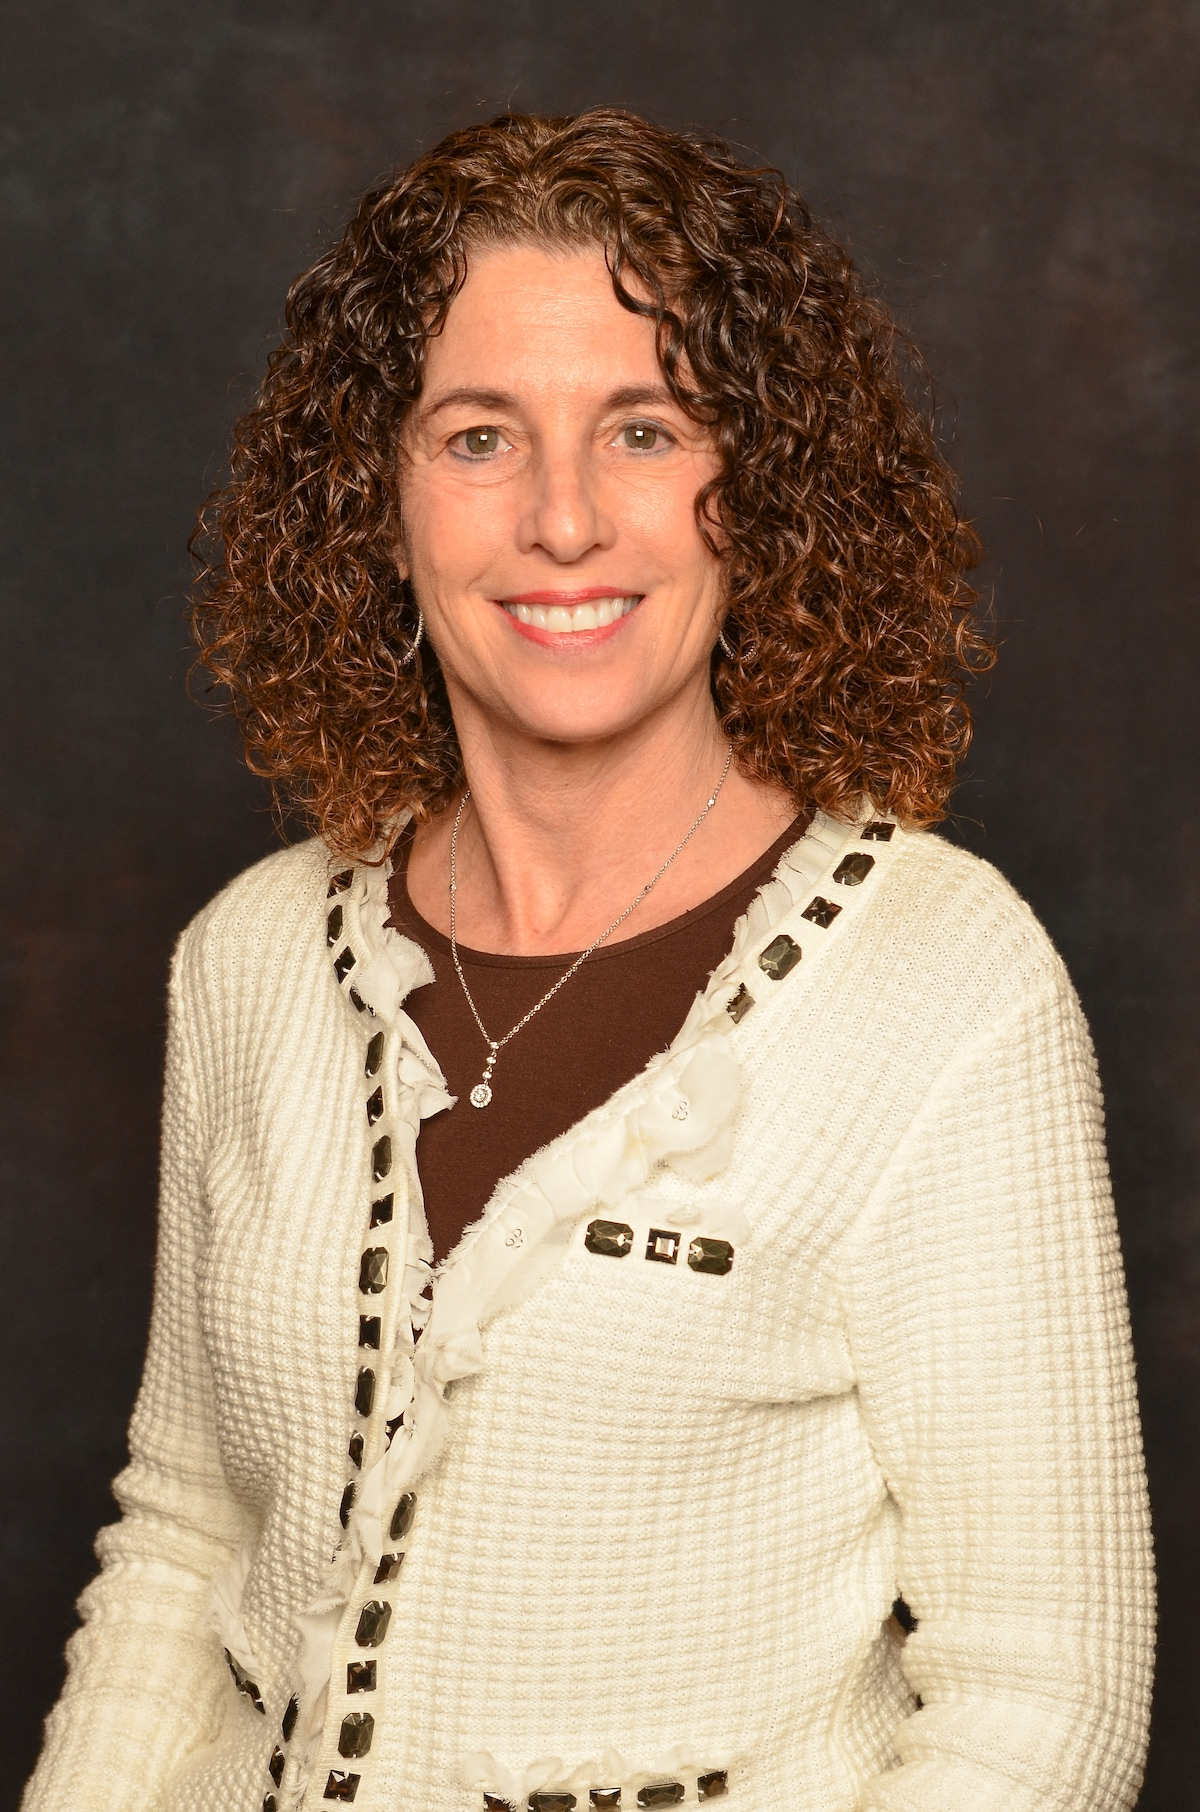 Susan from Manhattan Beach